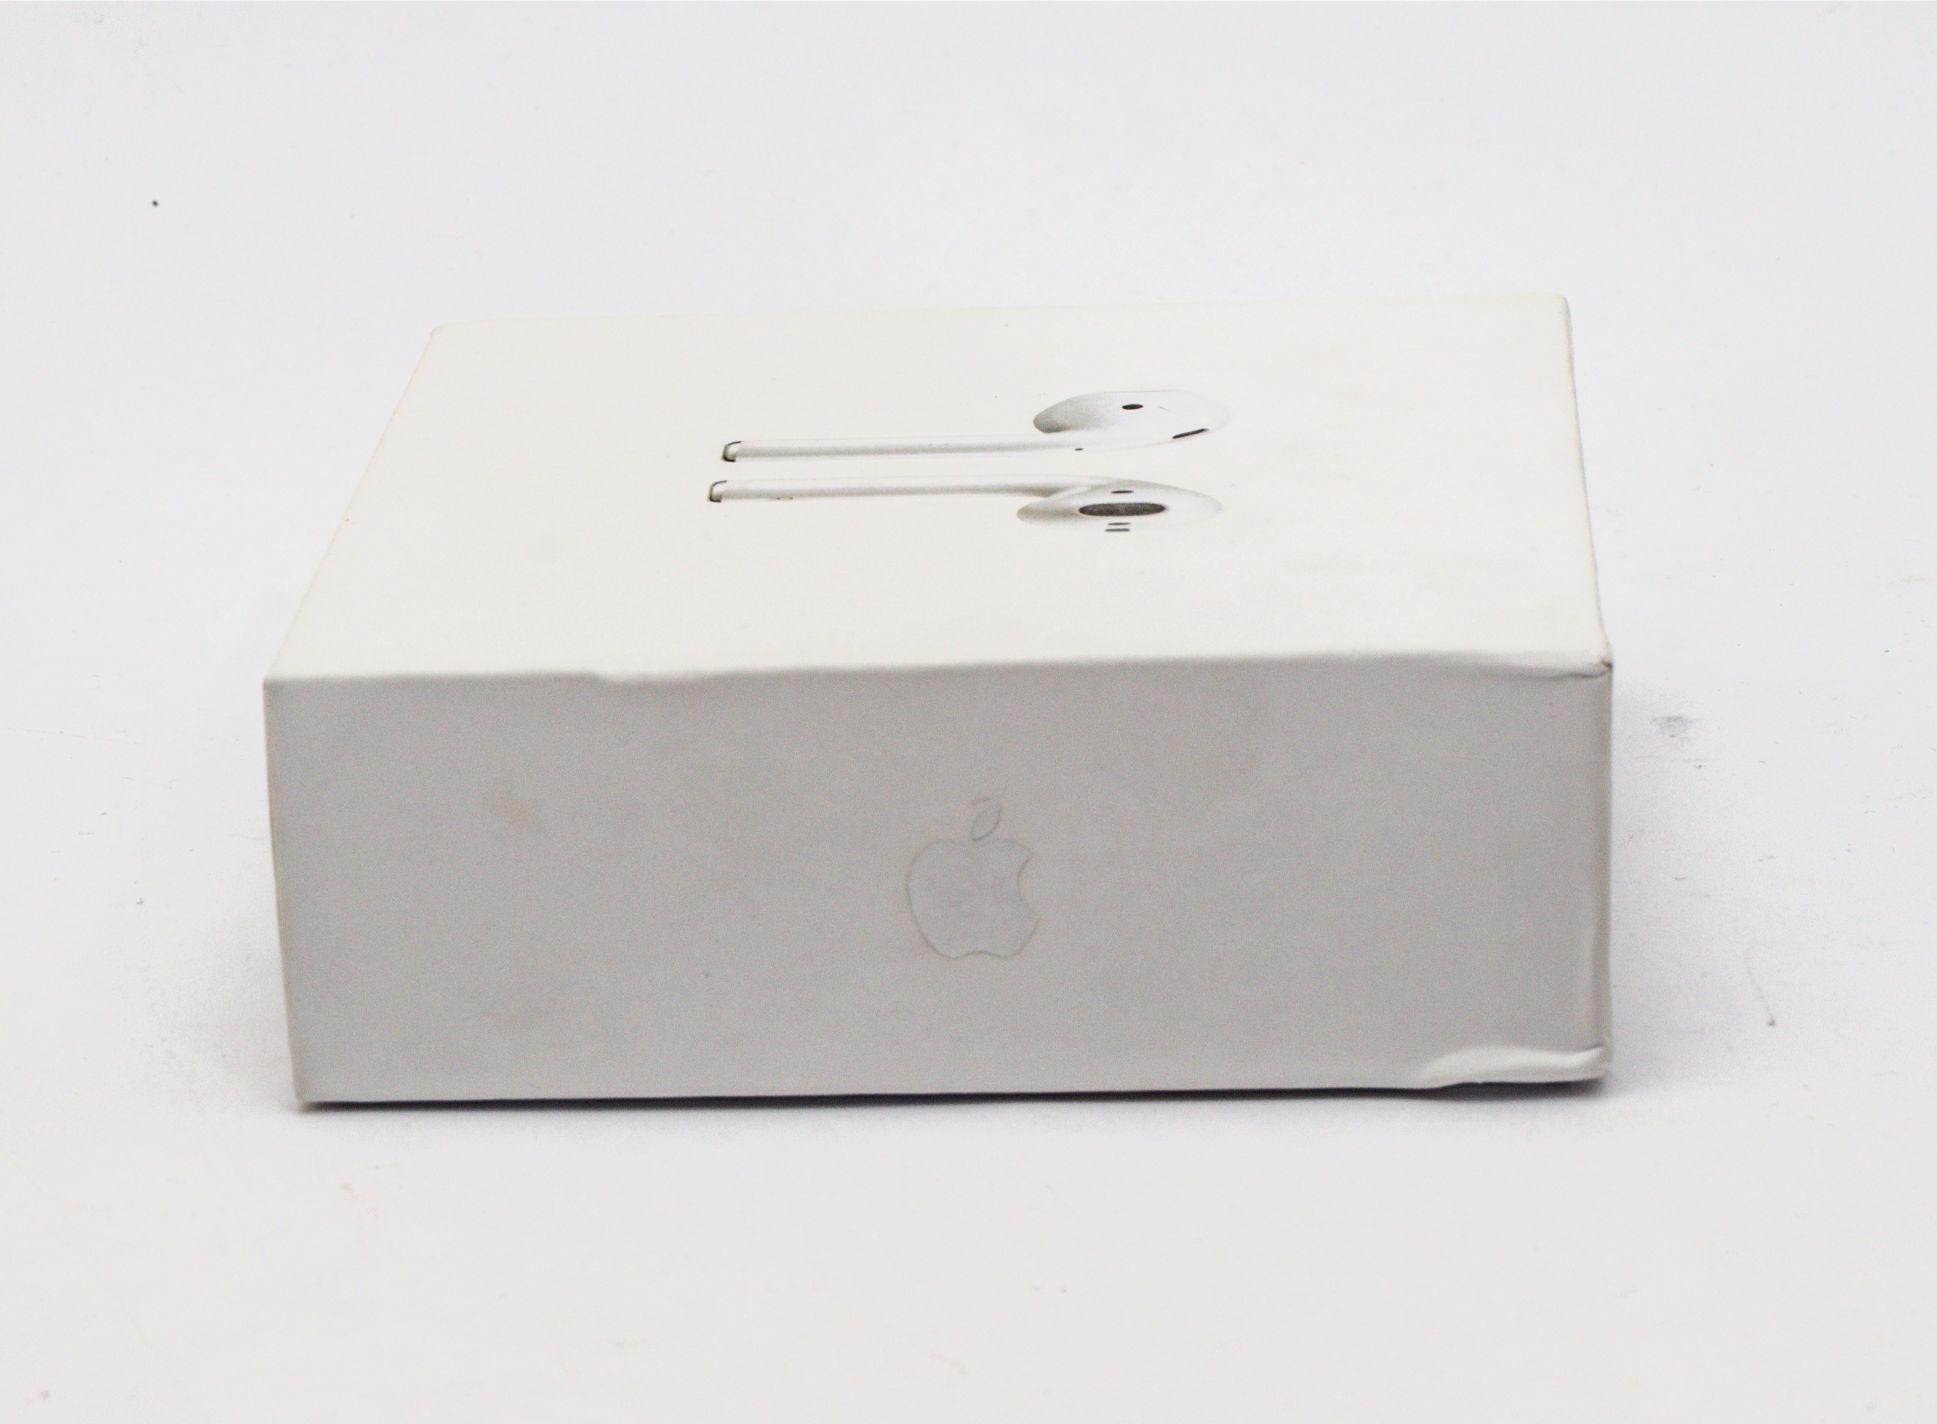 Airpods Apple Semi Original بسعر 830ج بدل من 1150ج Phone Accessories Computer Computer Mouse